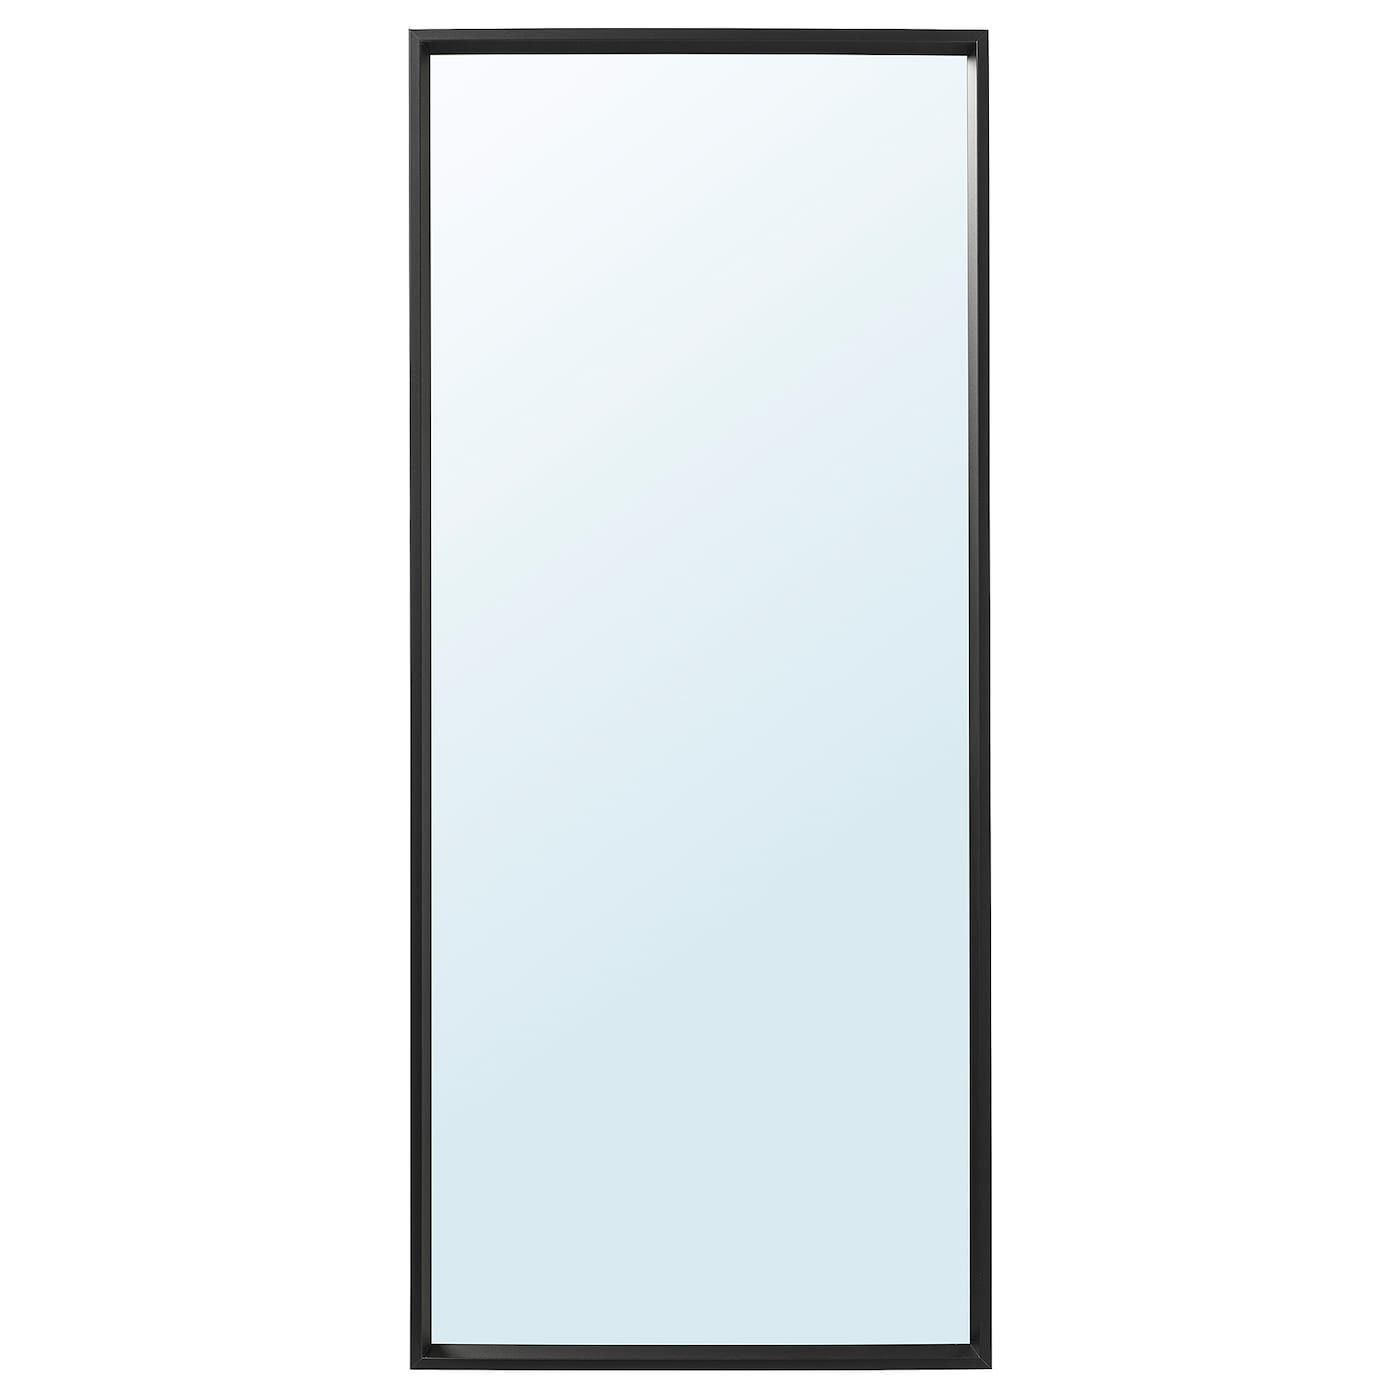 Nissedal Mirror Black 255 8x59 Ikea In 2021 Ikea Nissedal Black Mirror Ikea Mirror